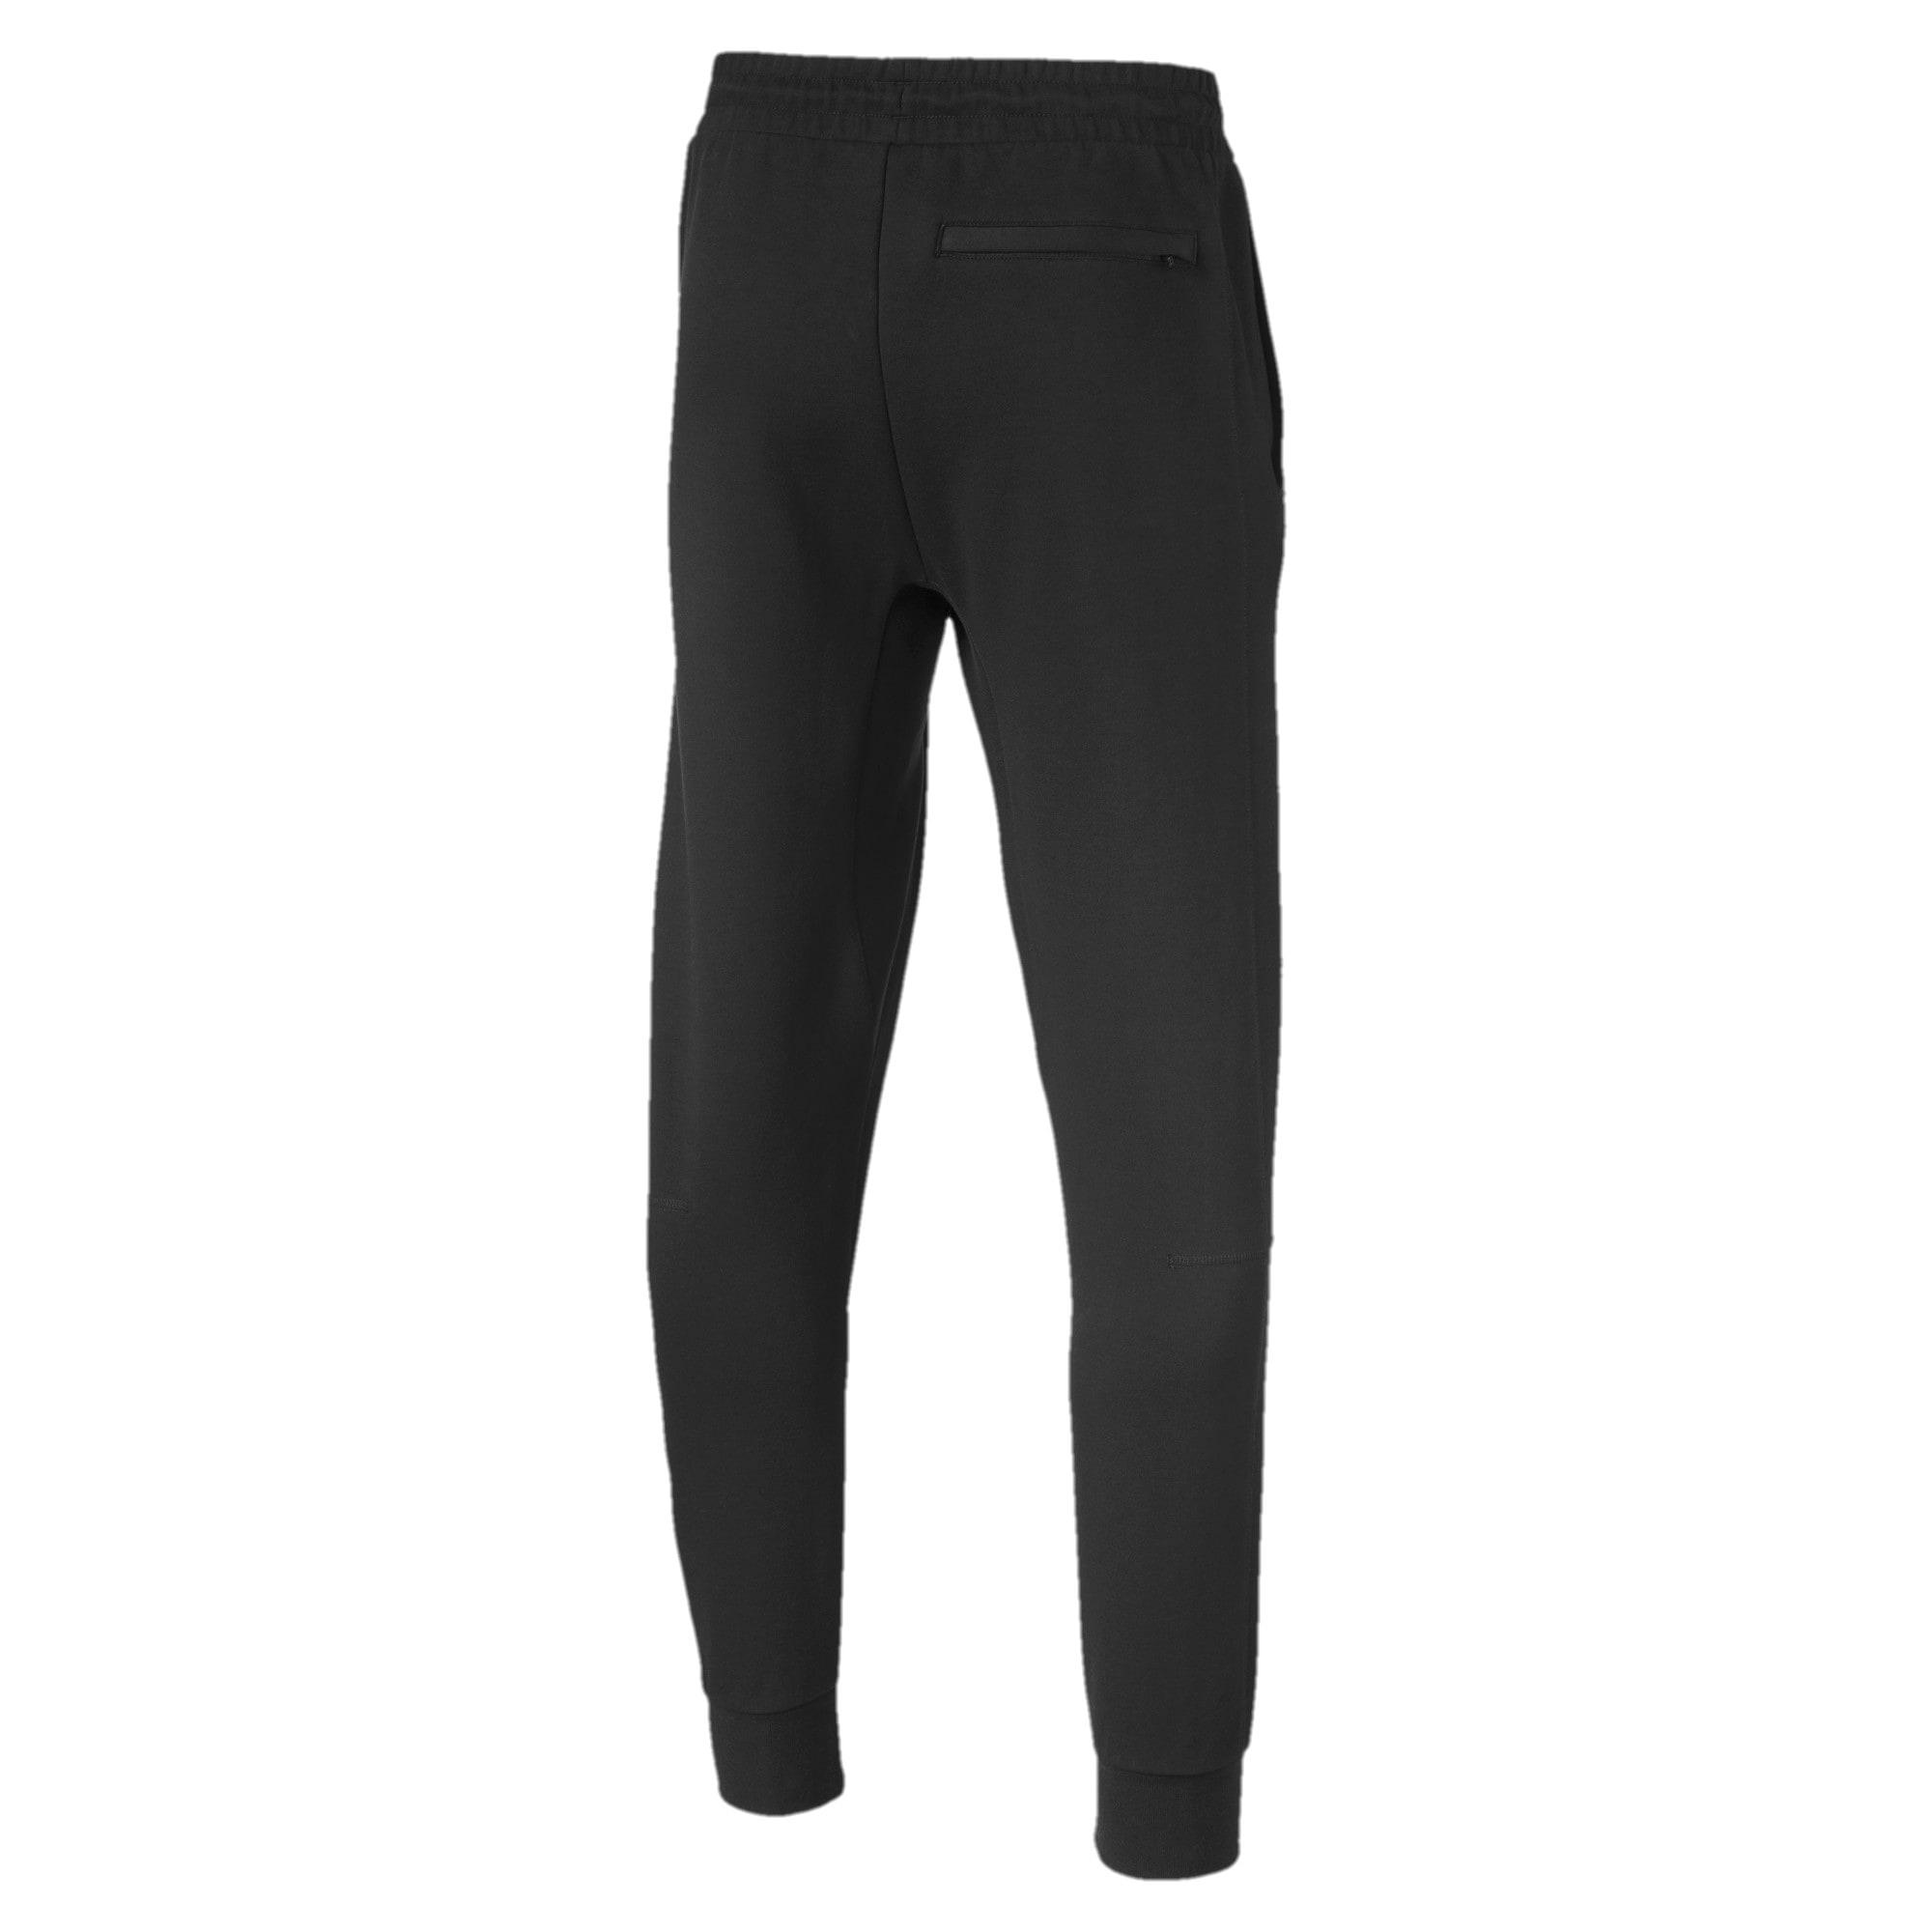 Thumbnail 5 of Epoch Knitted broek voor heren, Puma Black, medium